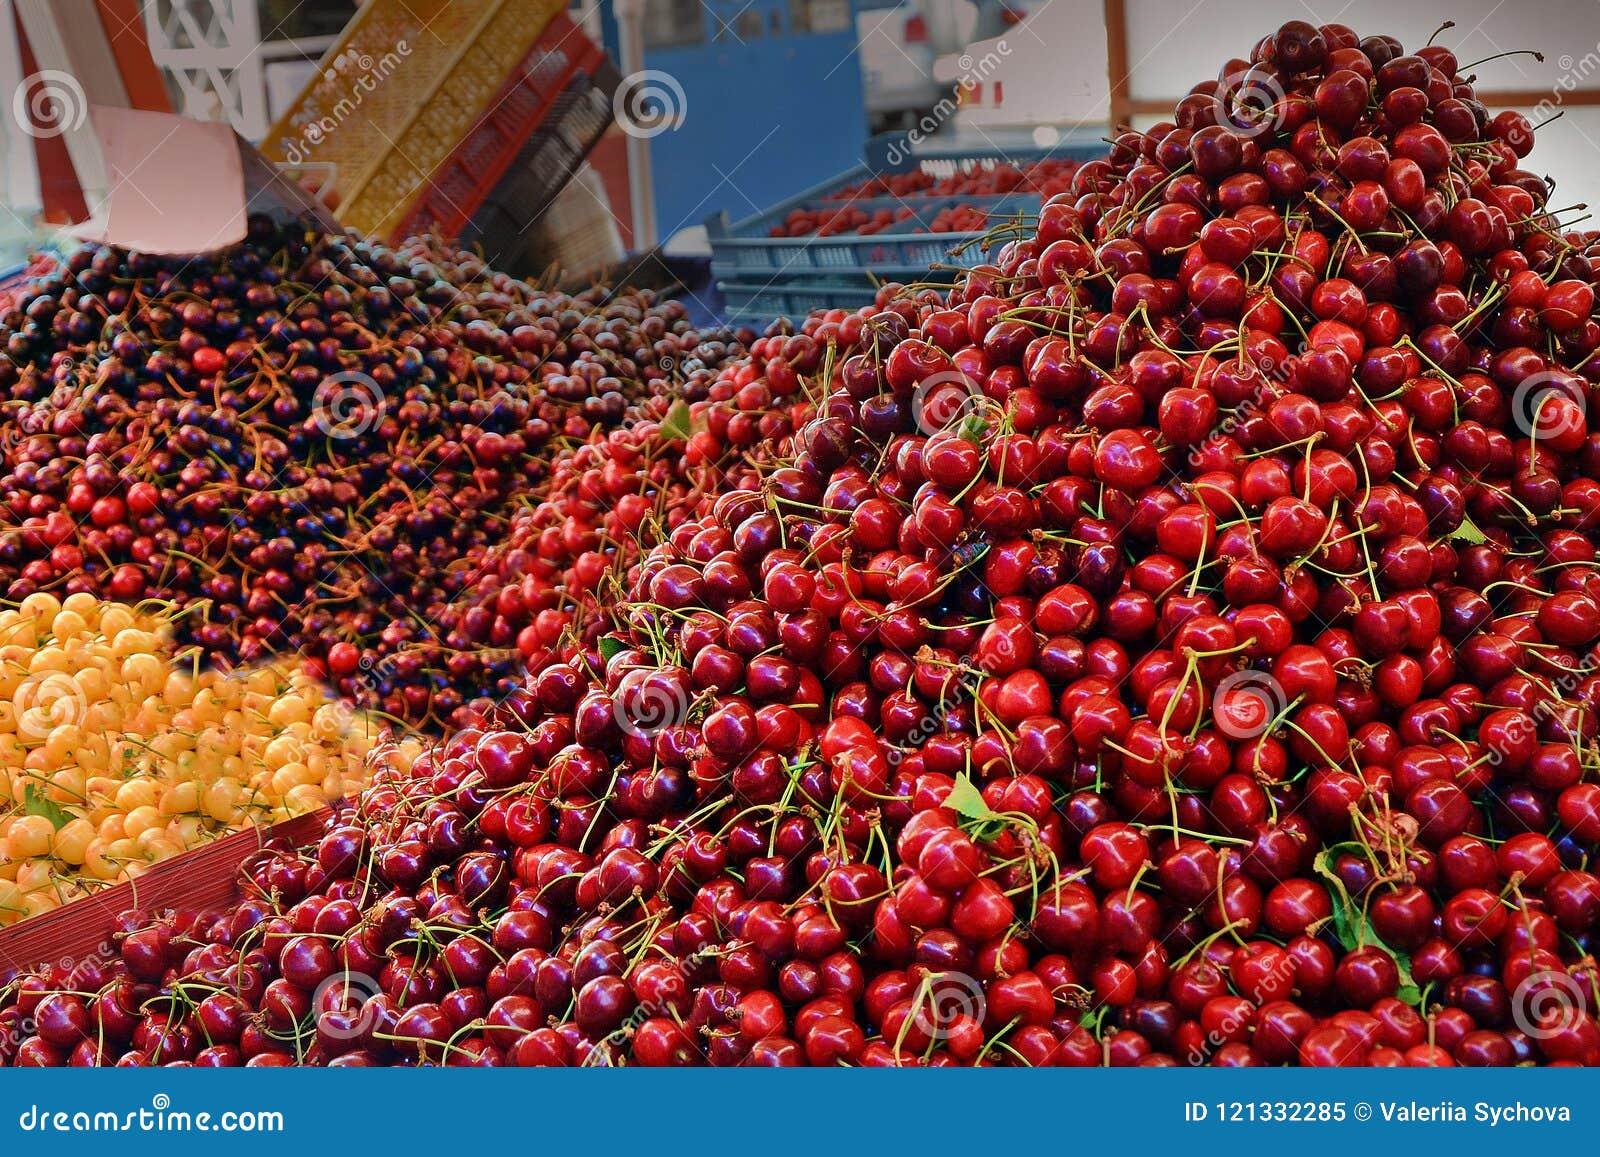 Different kinds sweet cherries on market. Sale juicy fruits in city Varna, Bulgaria. proper nutrition, vitamins, healthy food